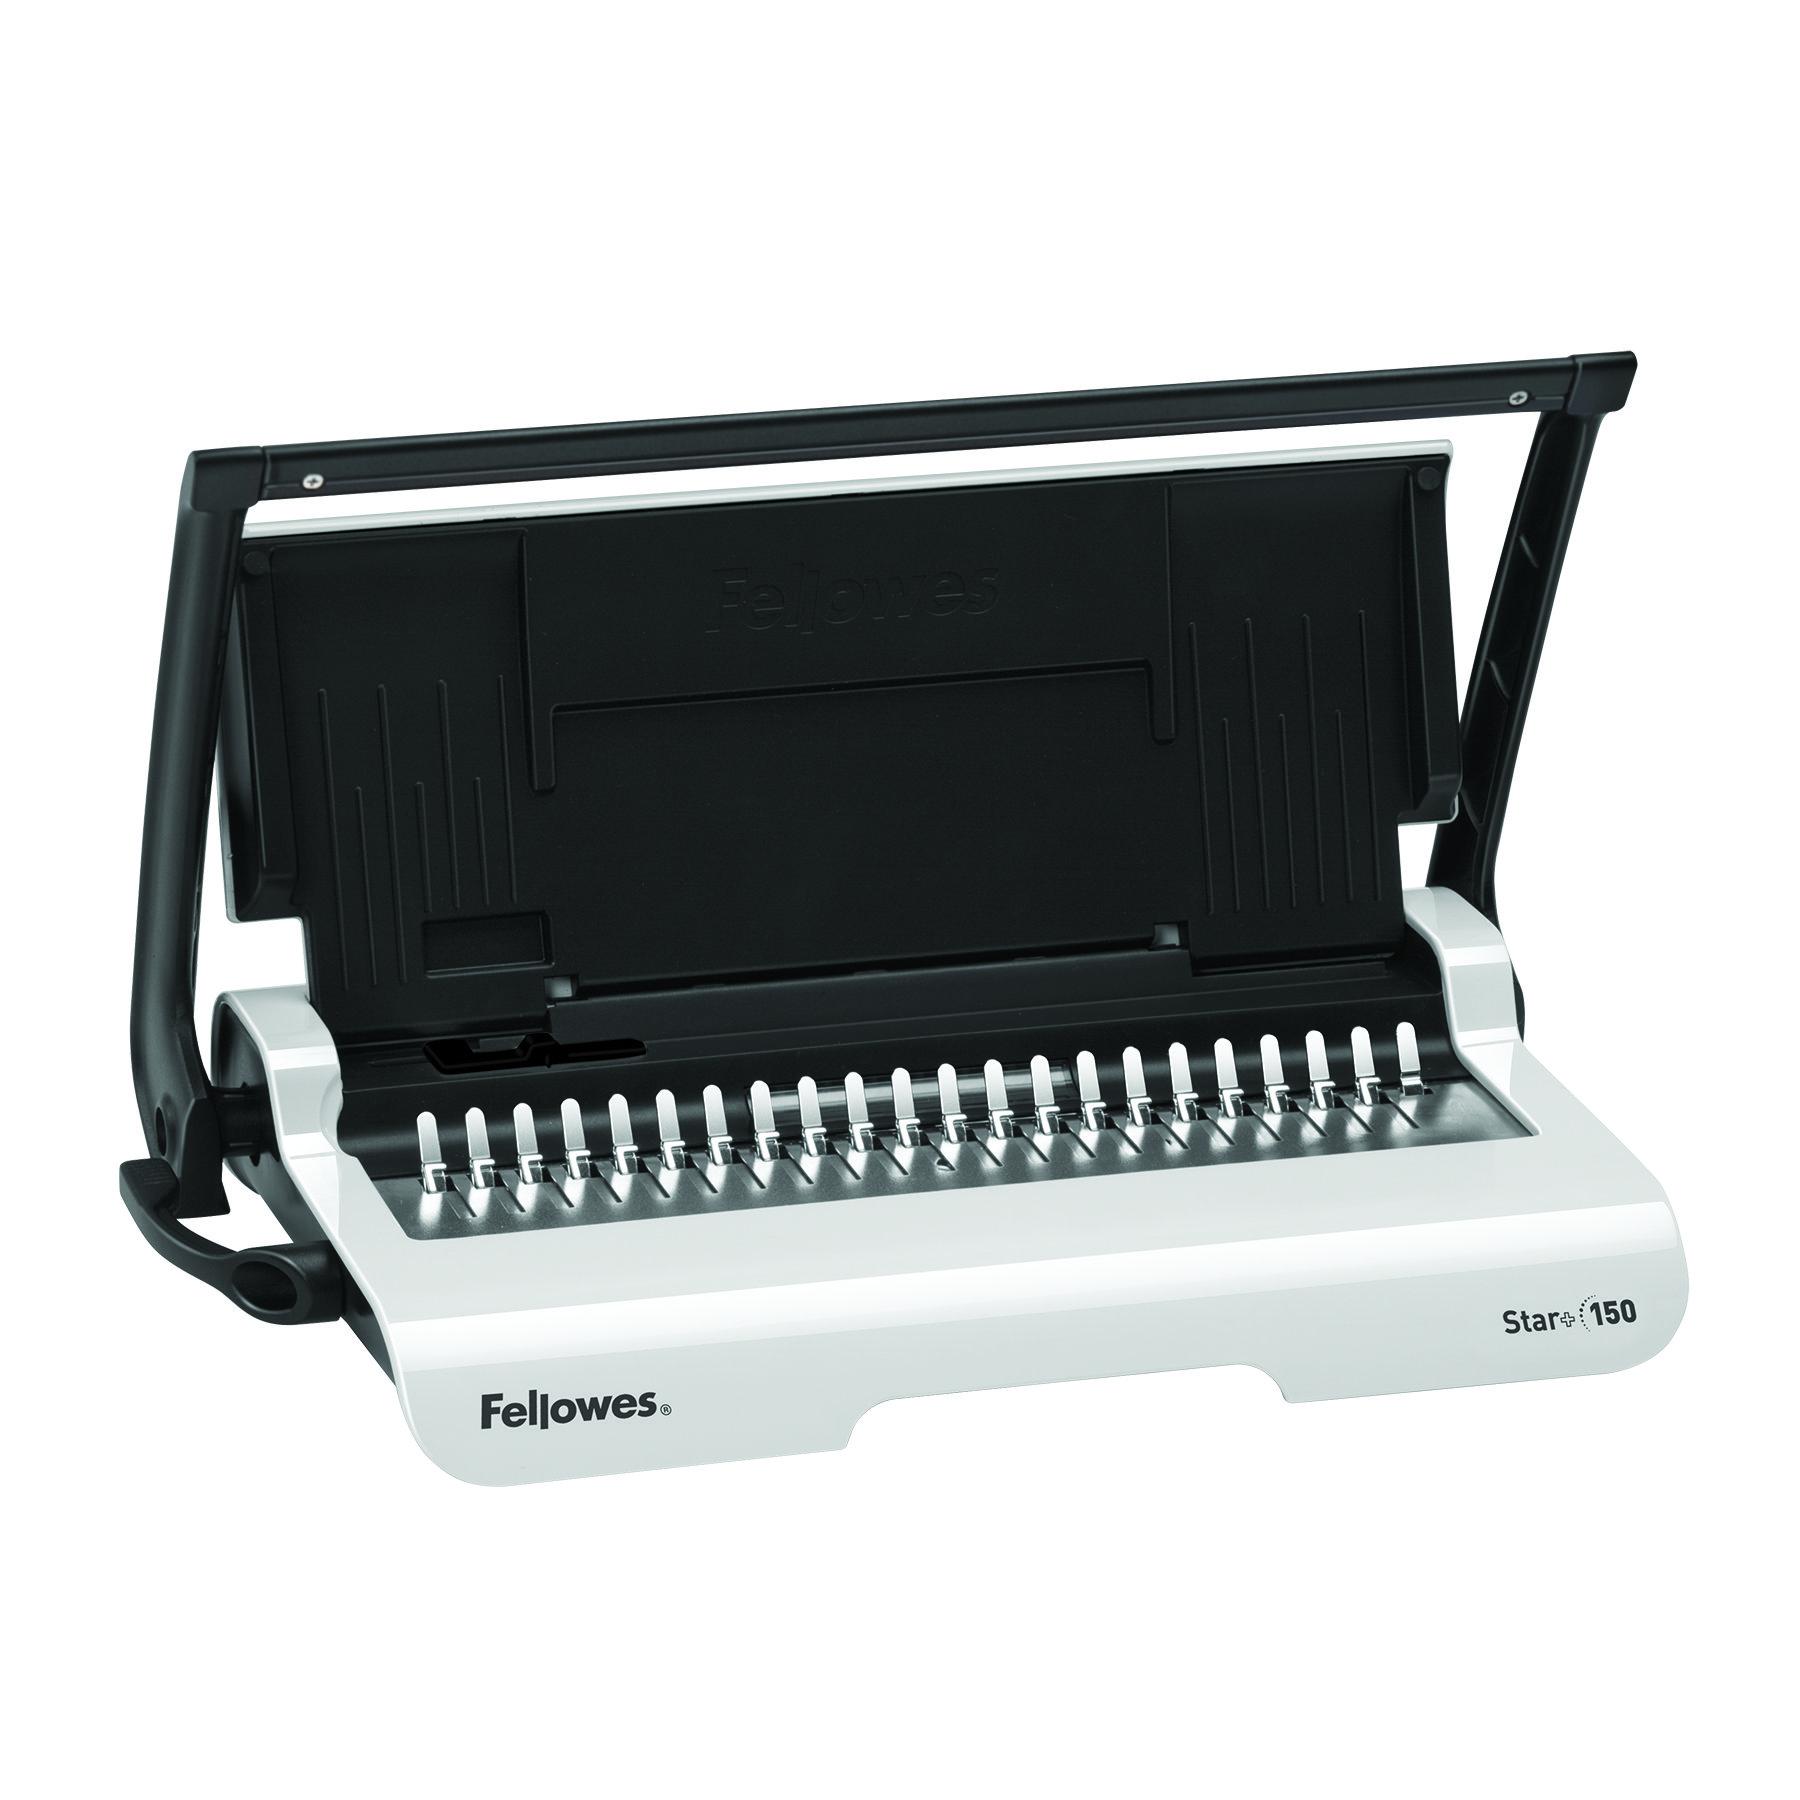 Fellowes Star A4 Manual Comb Binding Machine 5627501 - ACS Business